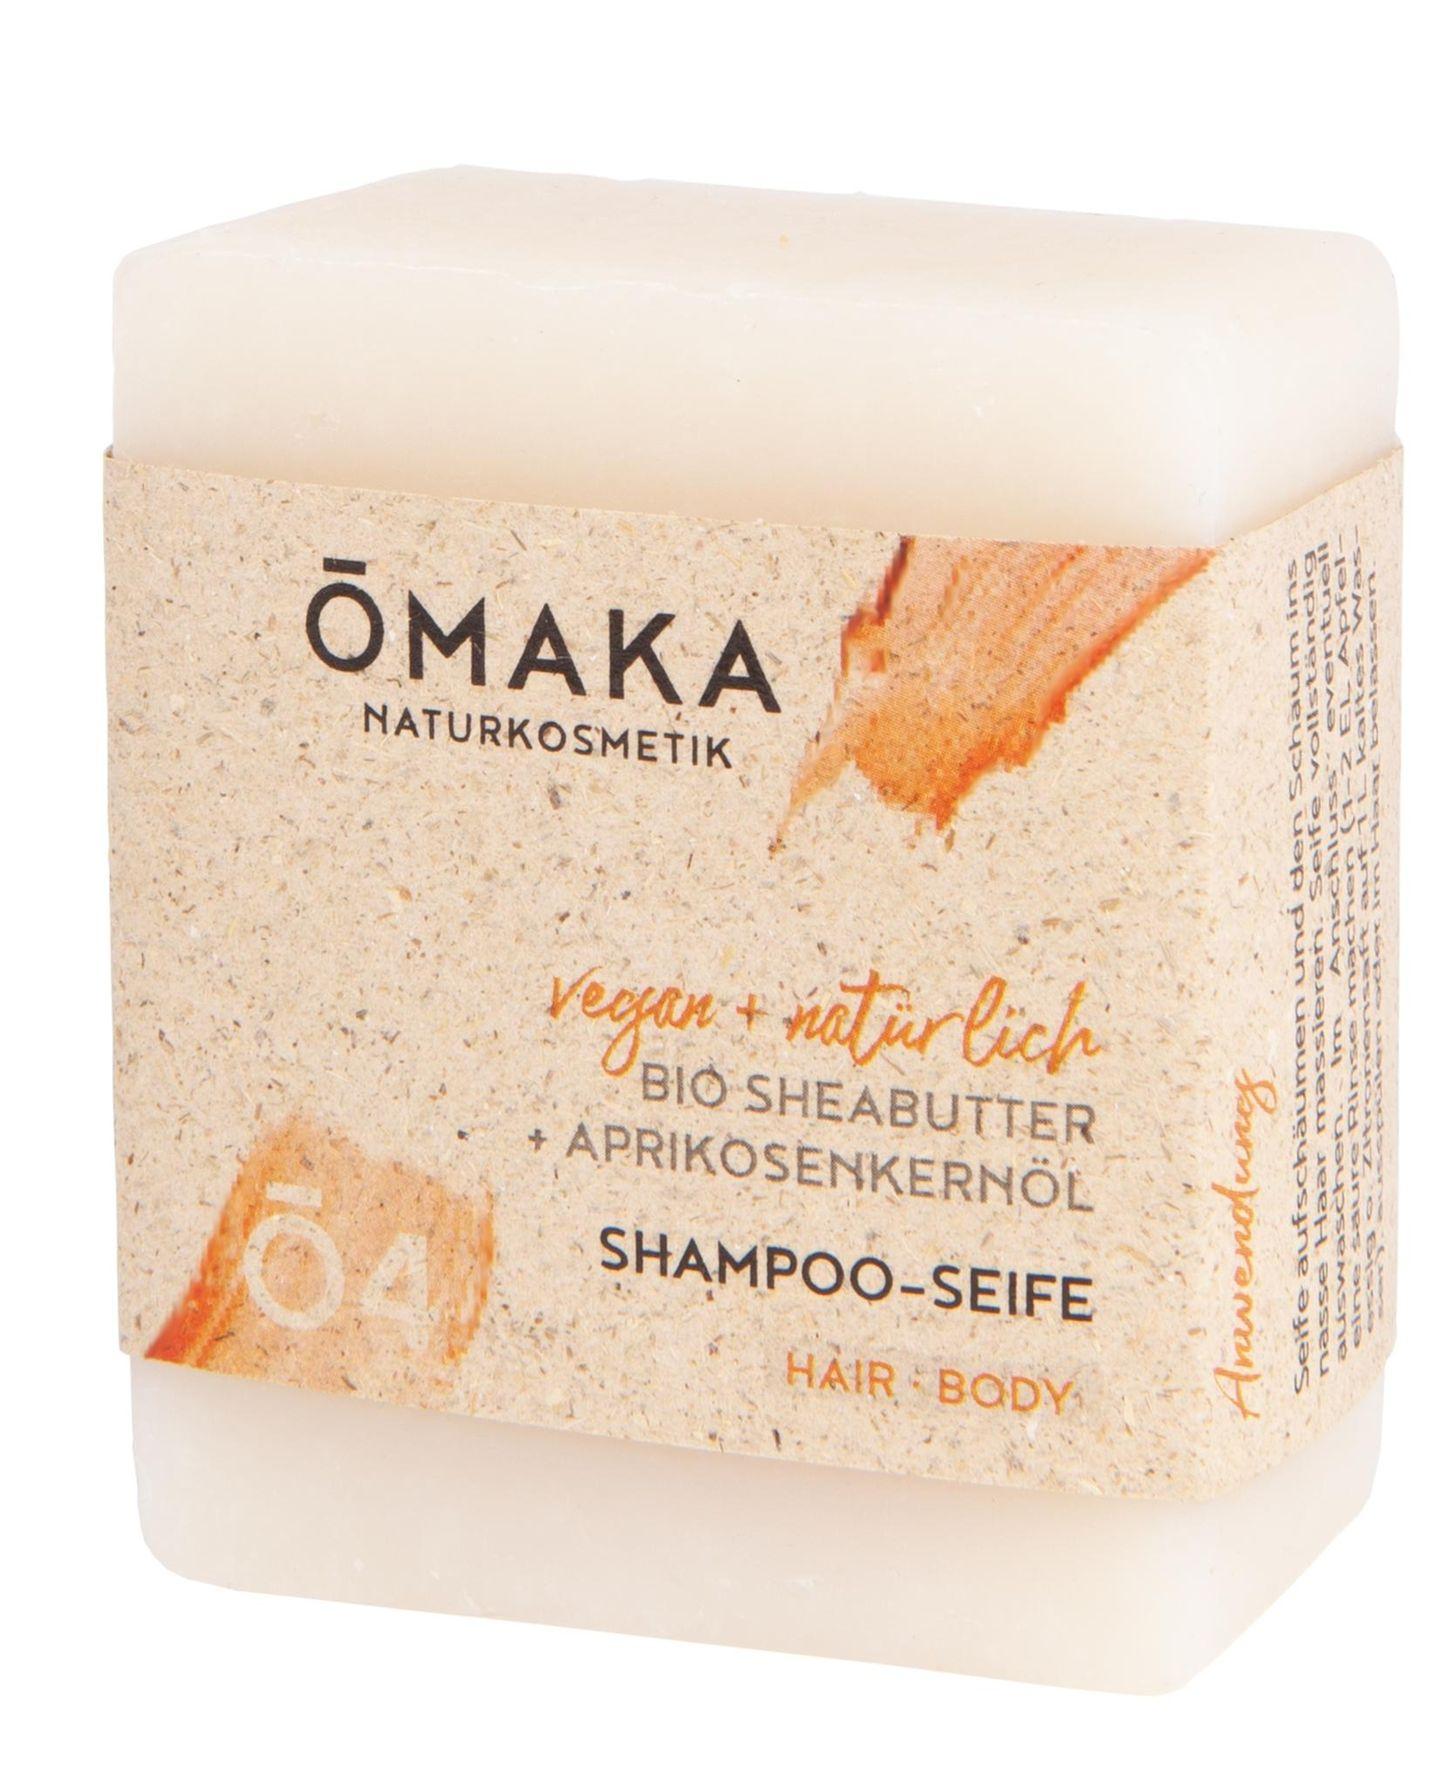 """Shampoo-Seife"" von Omaka, 100 g, ca. 10 Euro"